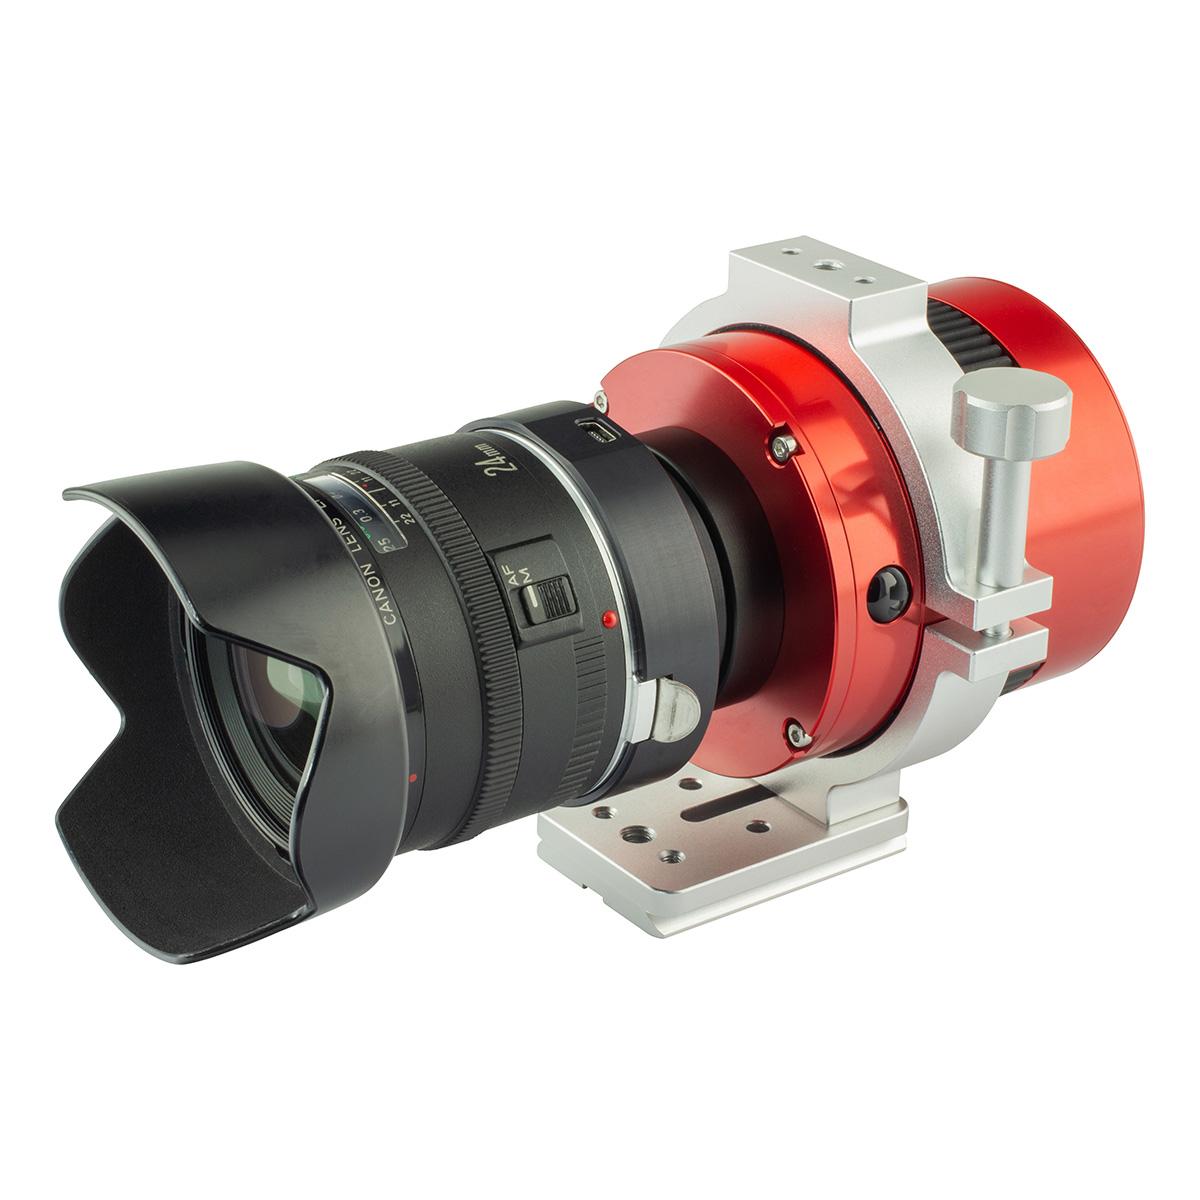 Focuser pour objectifs Canon, Sigma, Tamron,... Astromechanics_ASCOM_APS-C_M42_to_Canon_Lens_Controller_Mark_II_a%5B2%5D